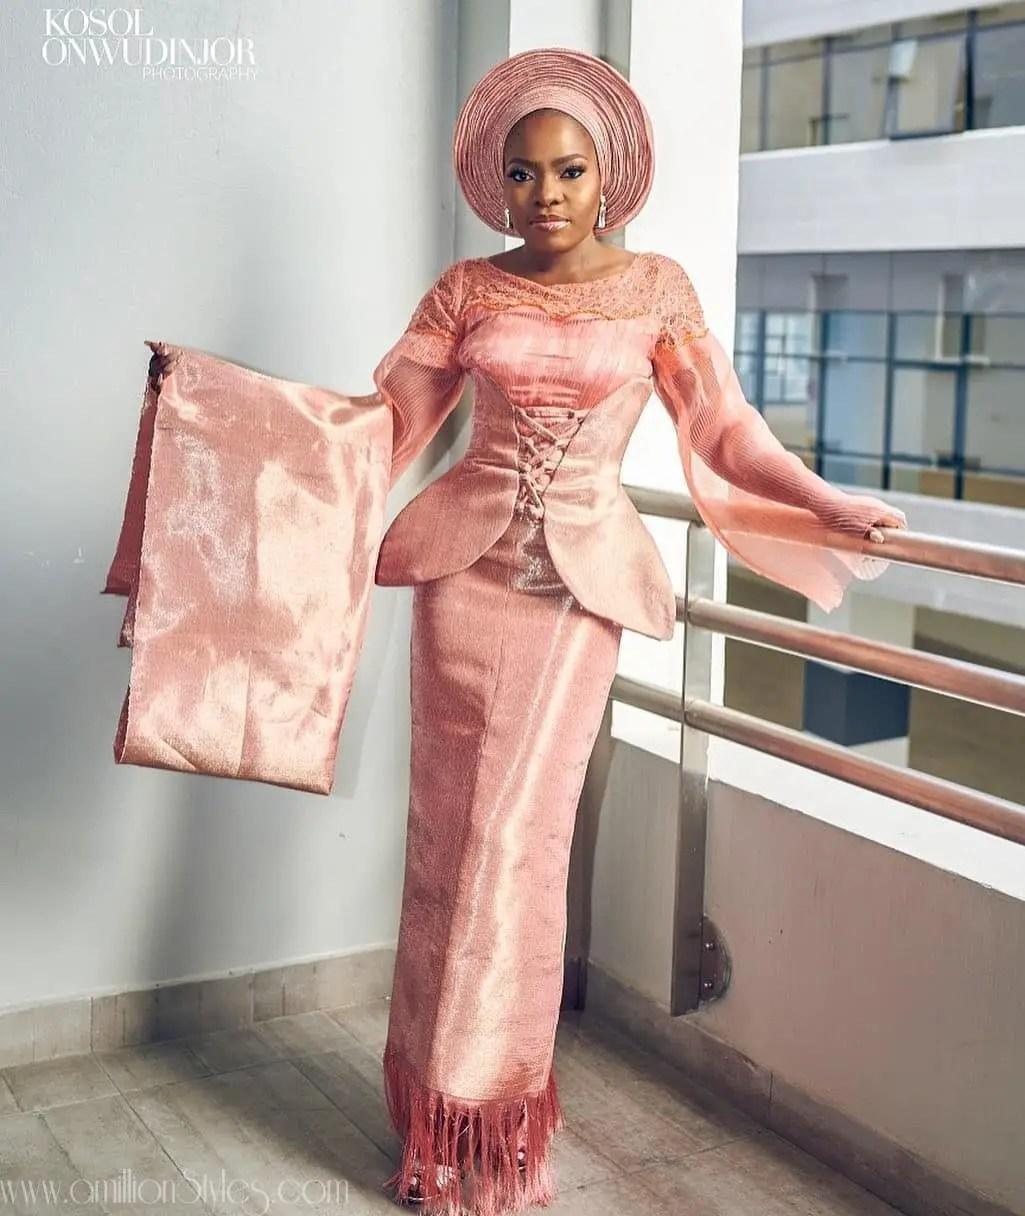 8 Yoruba Traditional Wedding Styles That Will WOW You